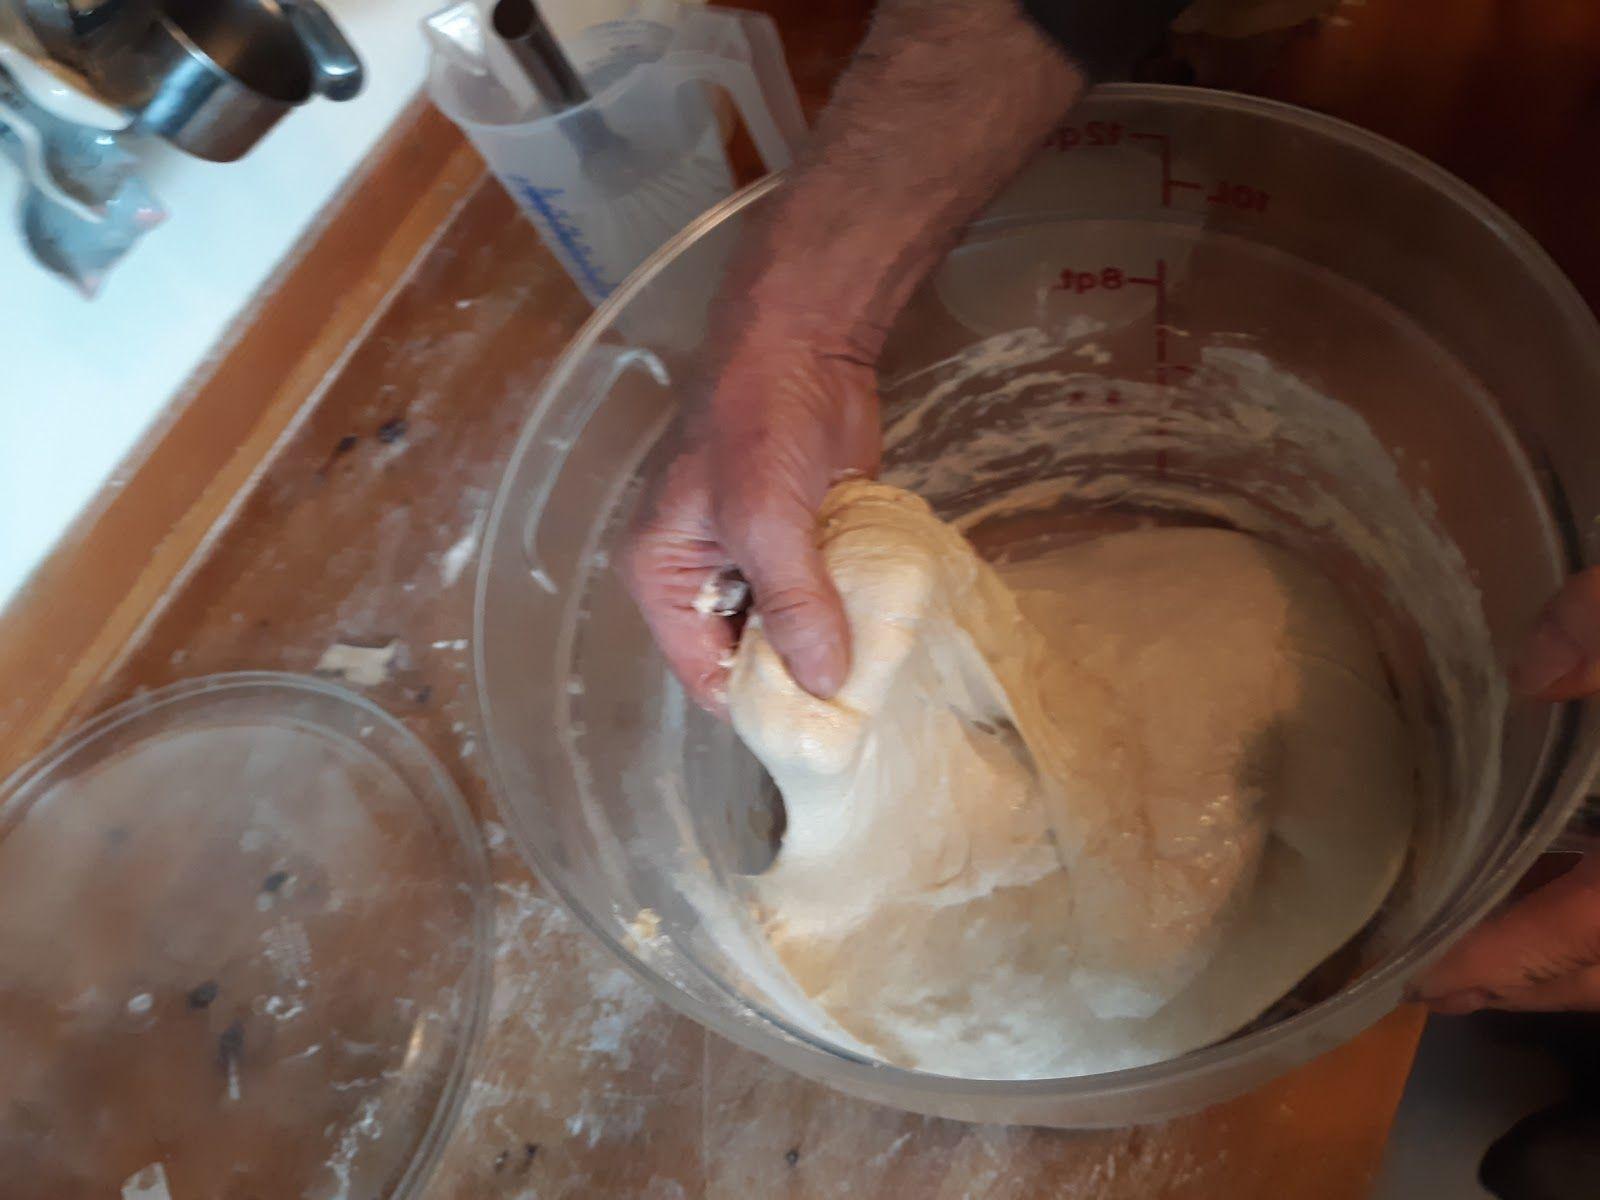 how to make bread dough - Bozeman, Montana